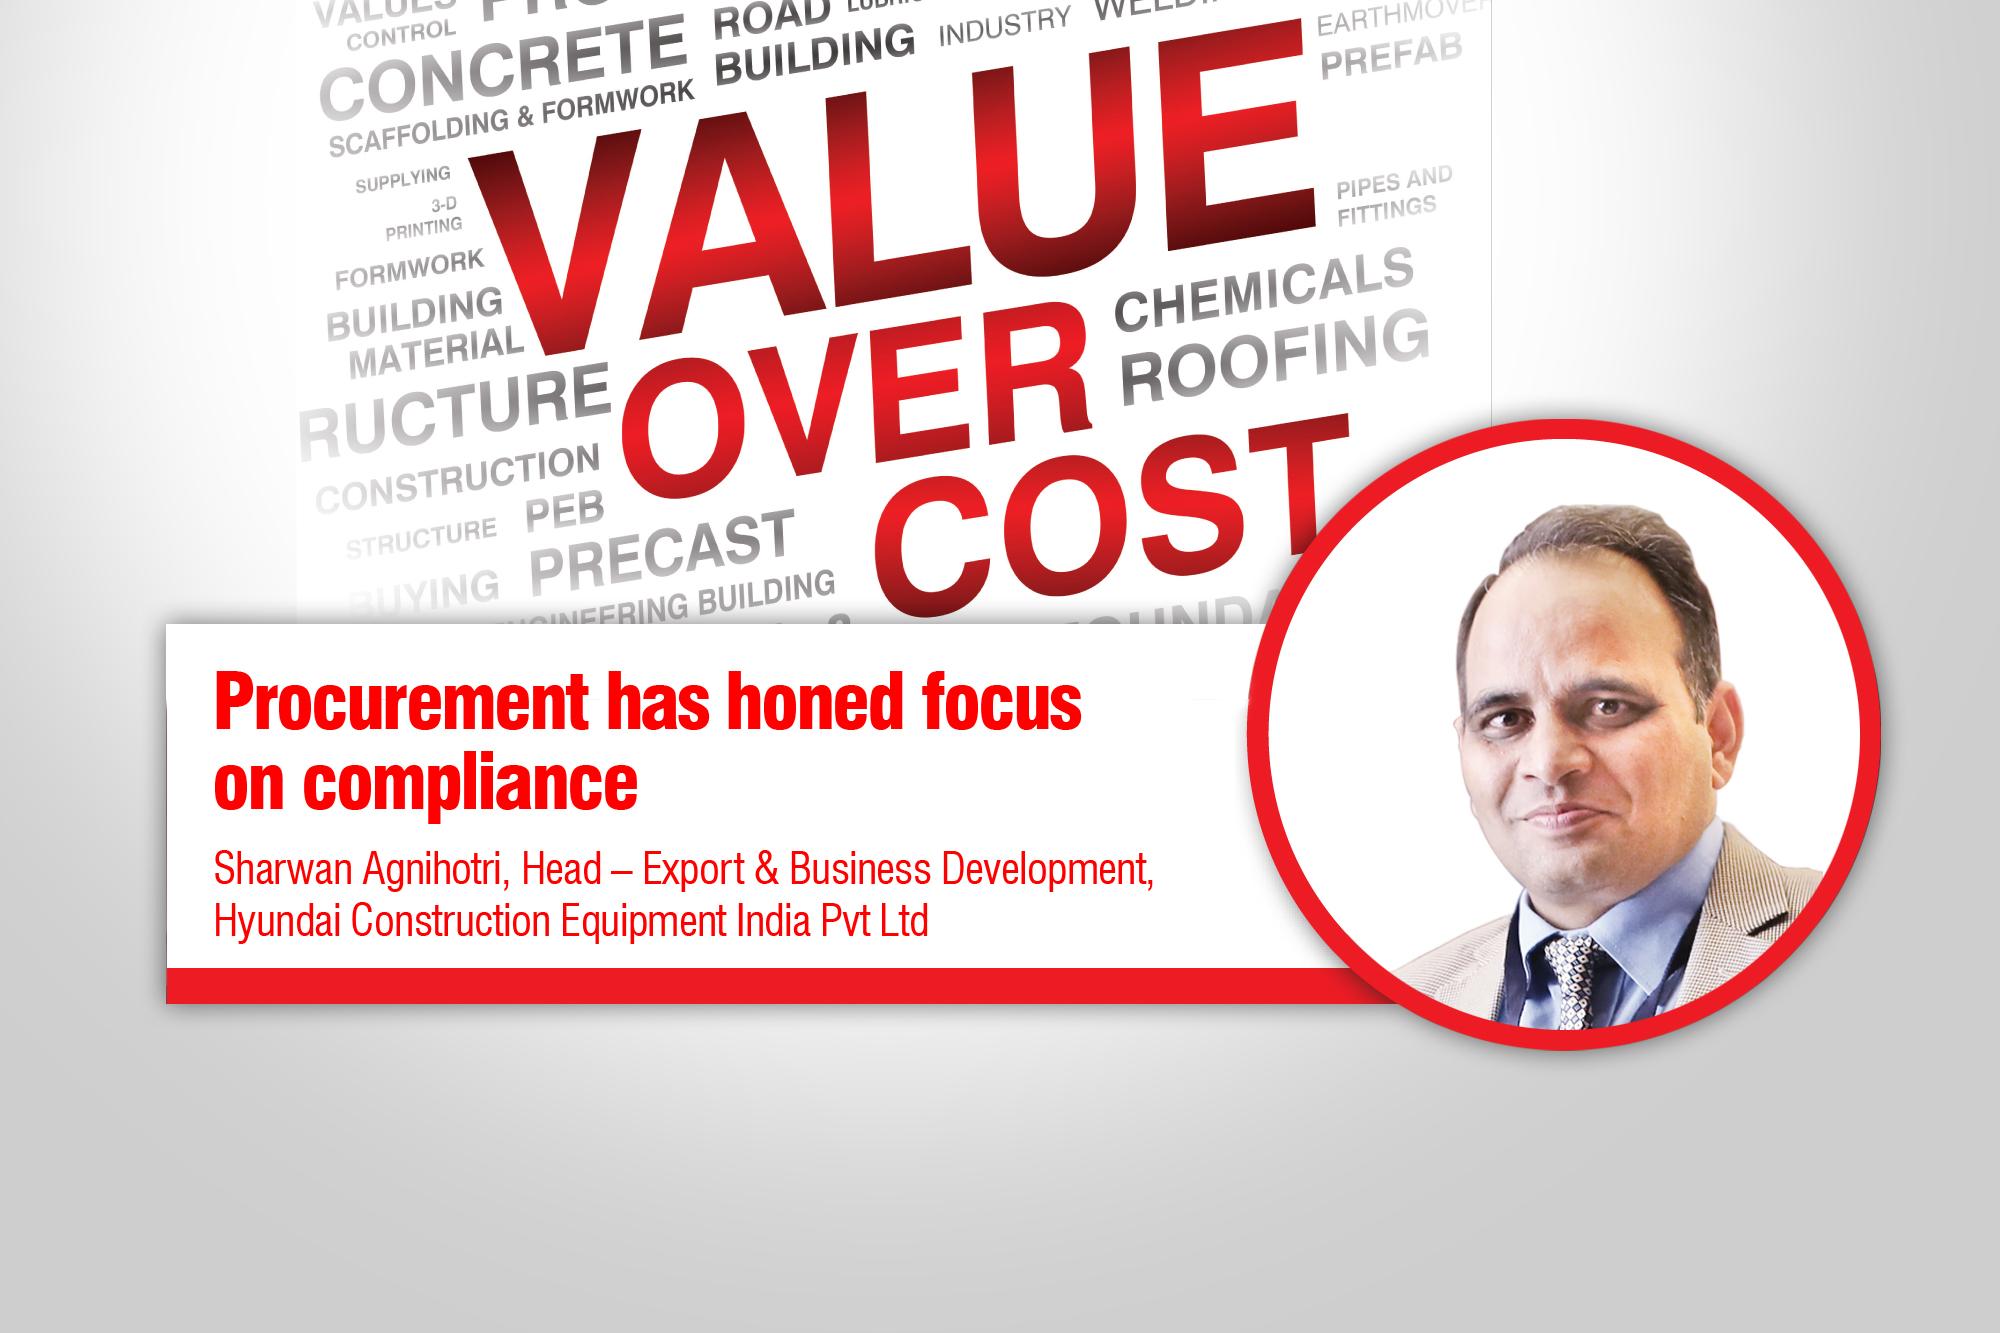 Procurement has honed focus on compliance